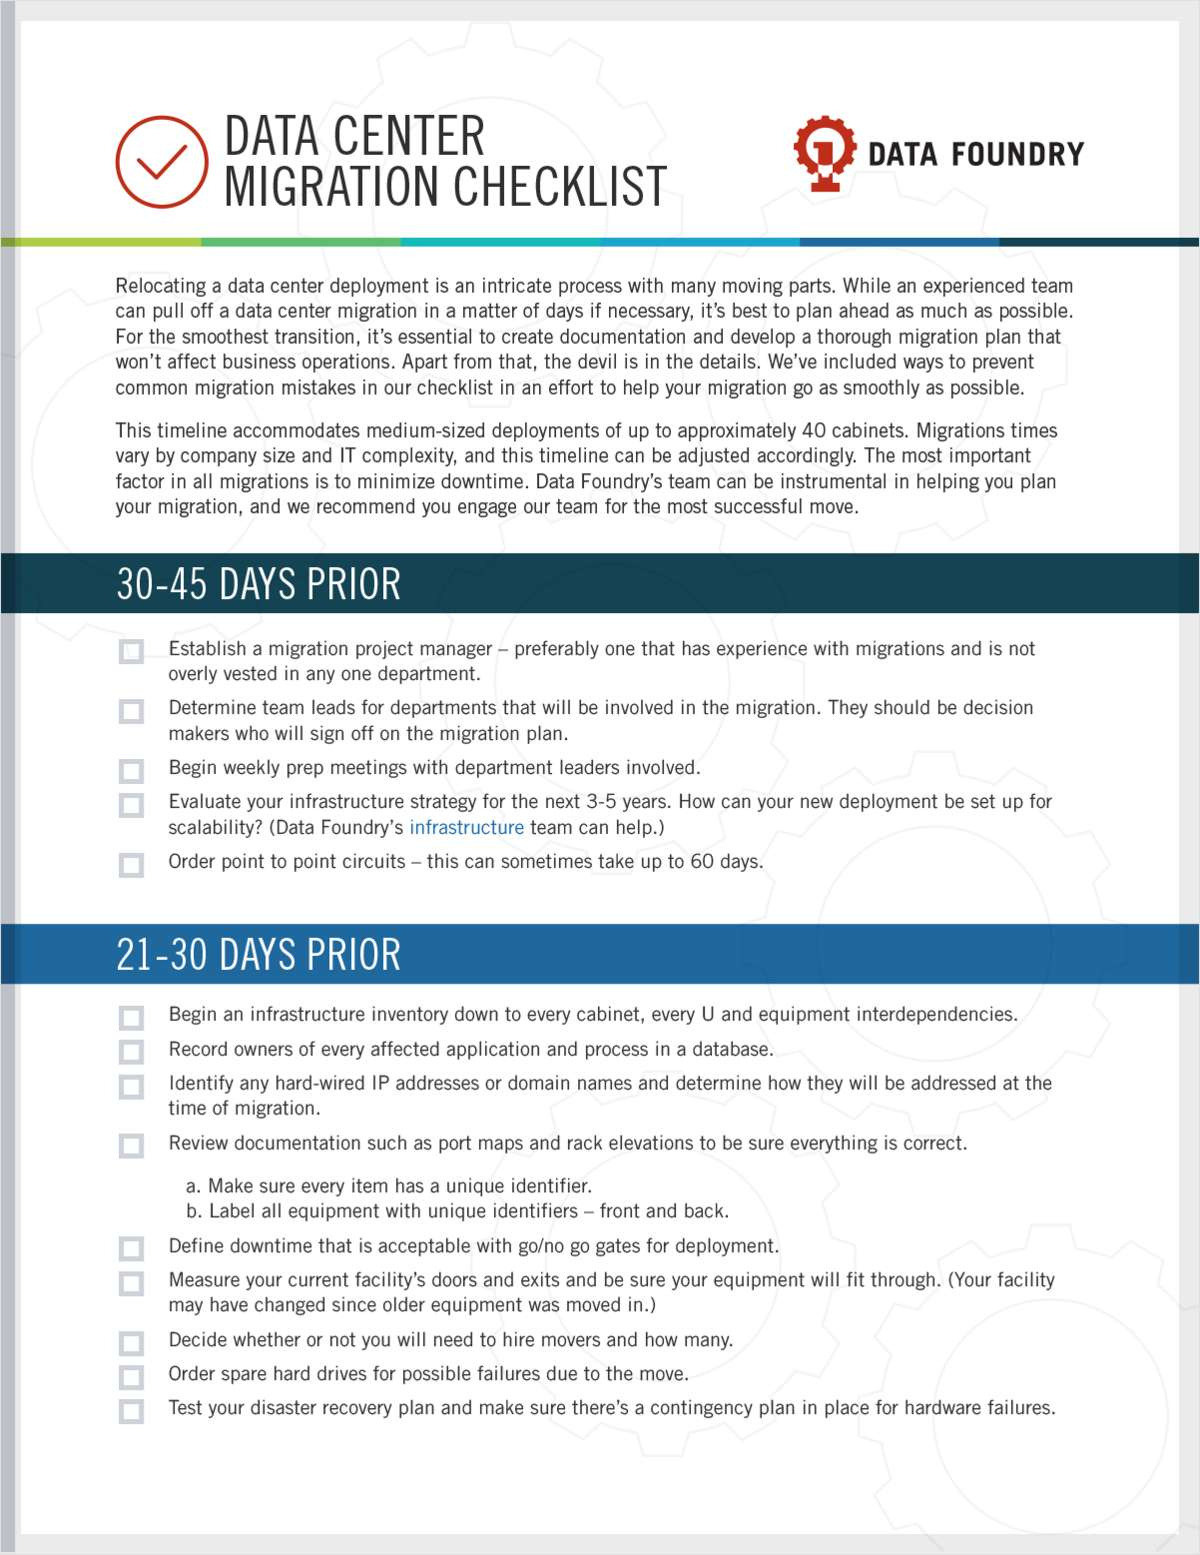 Data Center Migration Checklist, Free Data Foundry Checklist